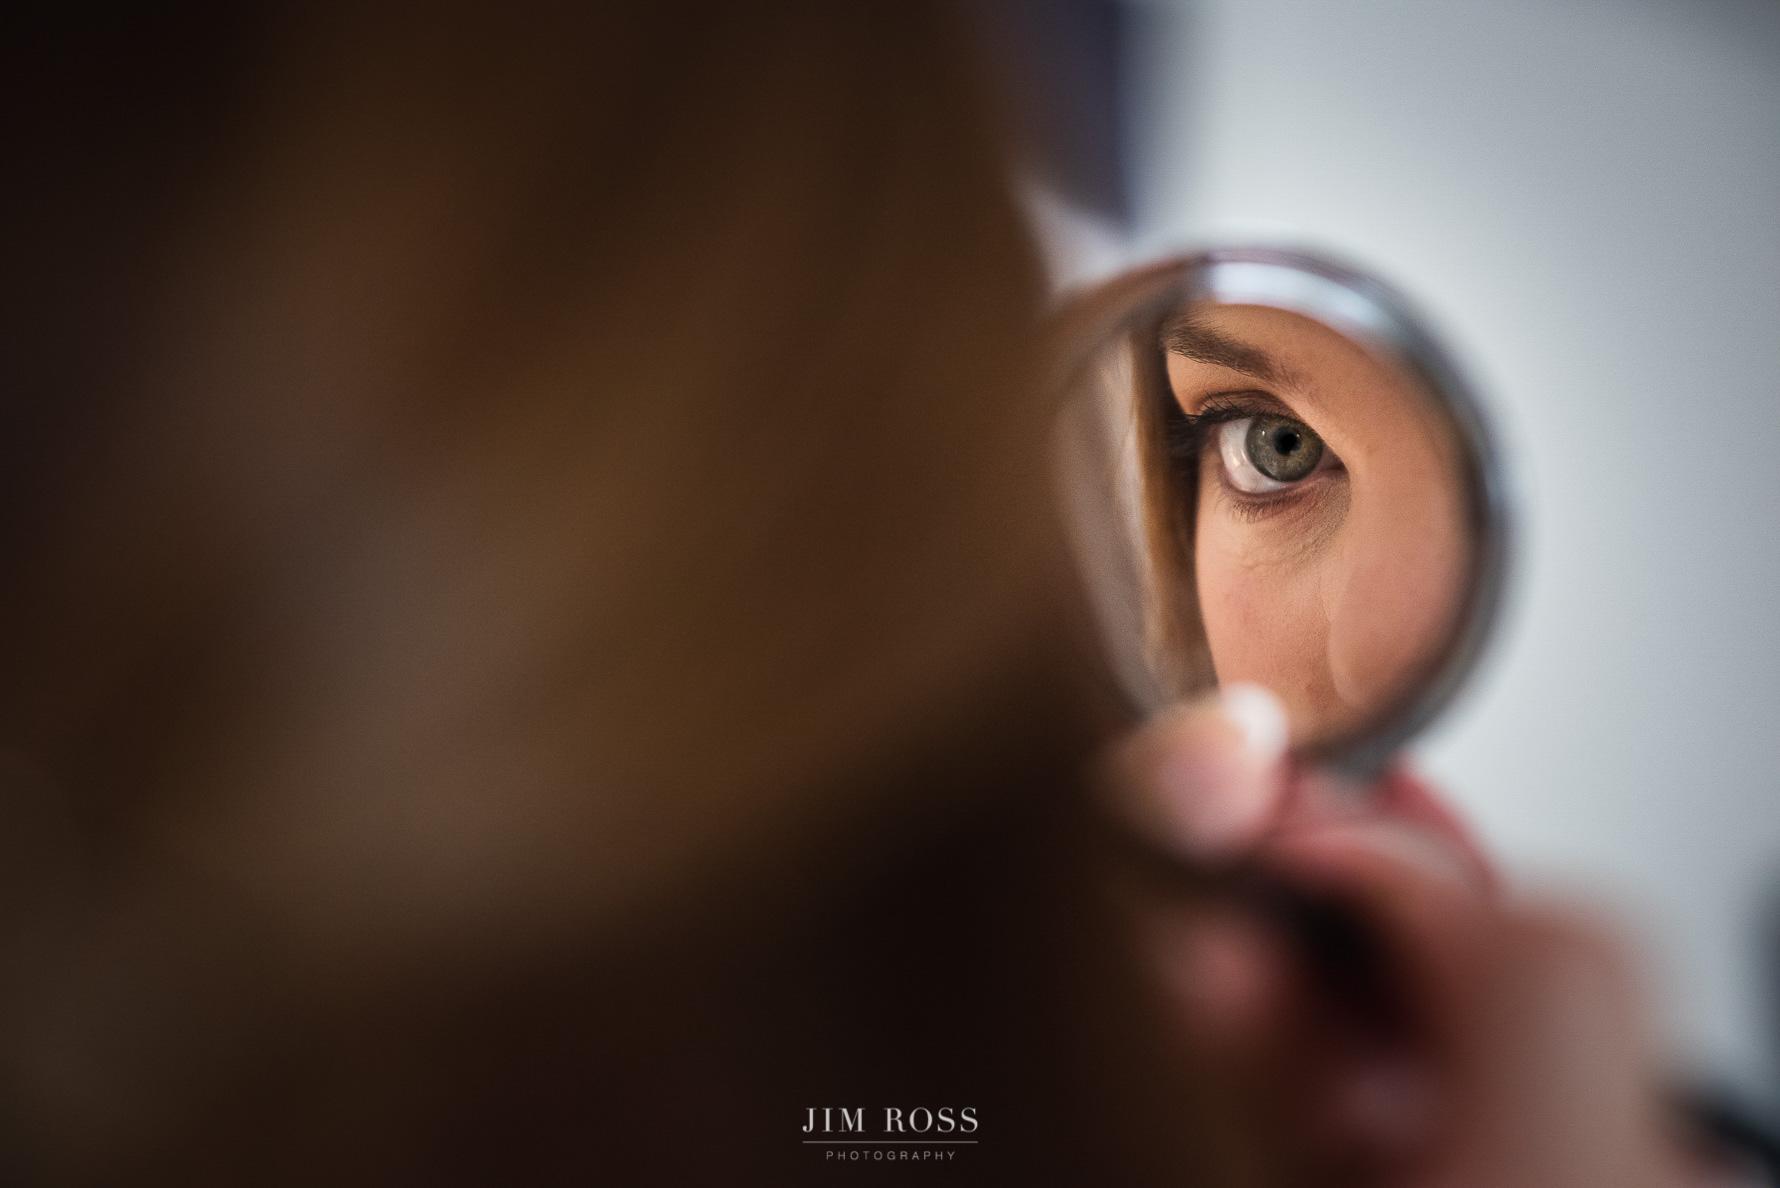 Makeup mirror eye close-up